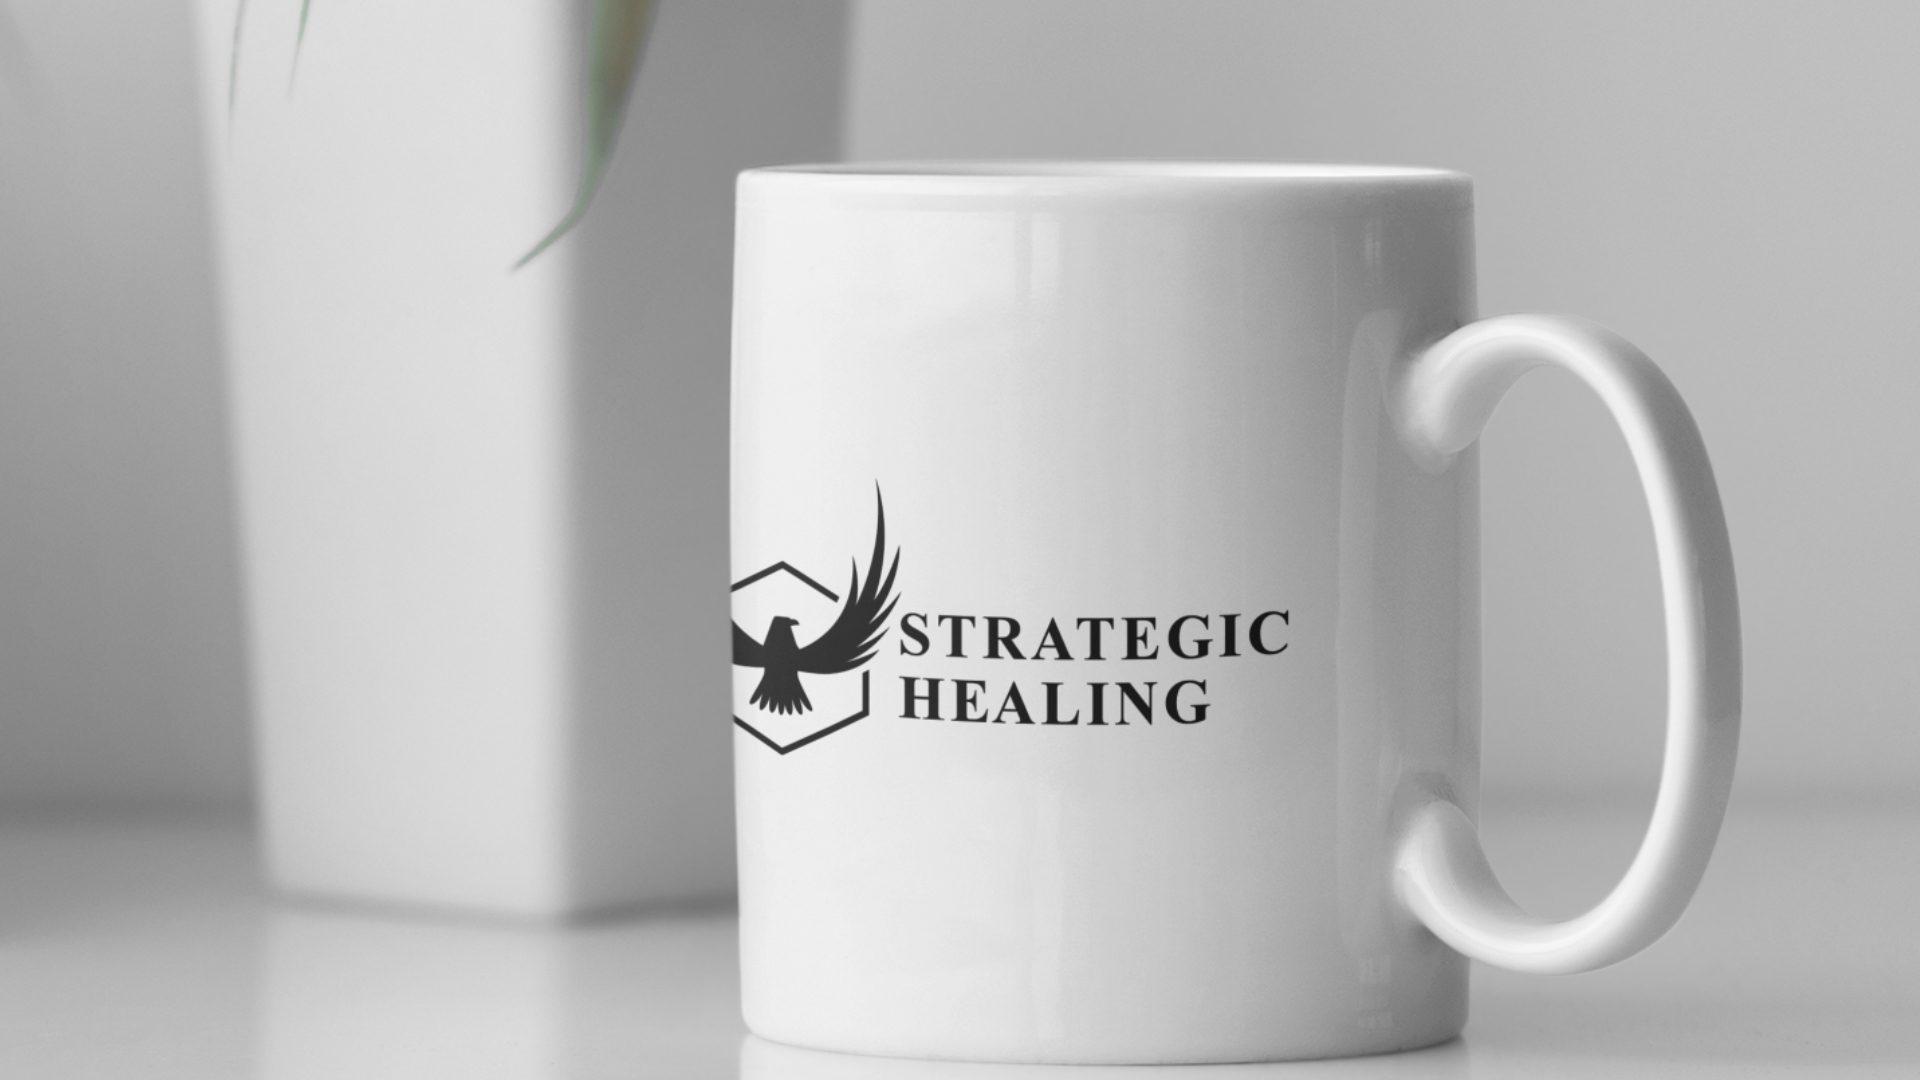 Strategic Healing - Eagle Logo Mockup 03